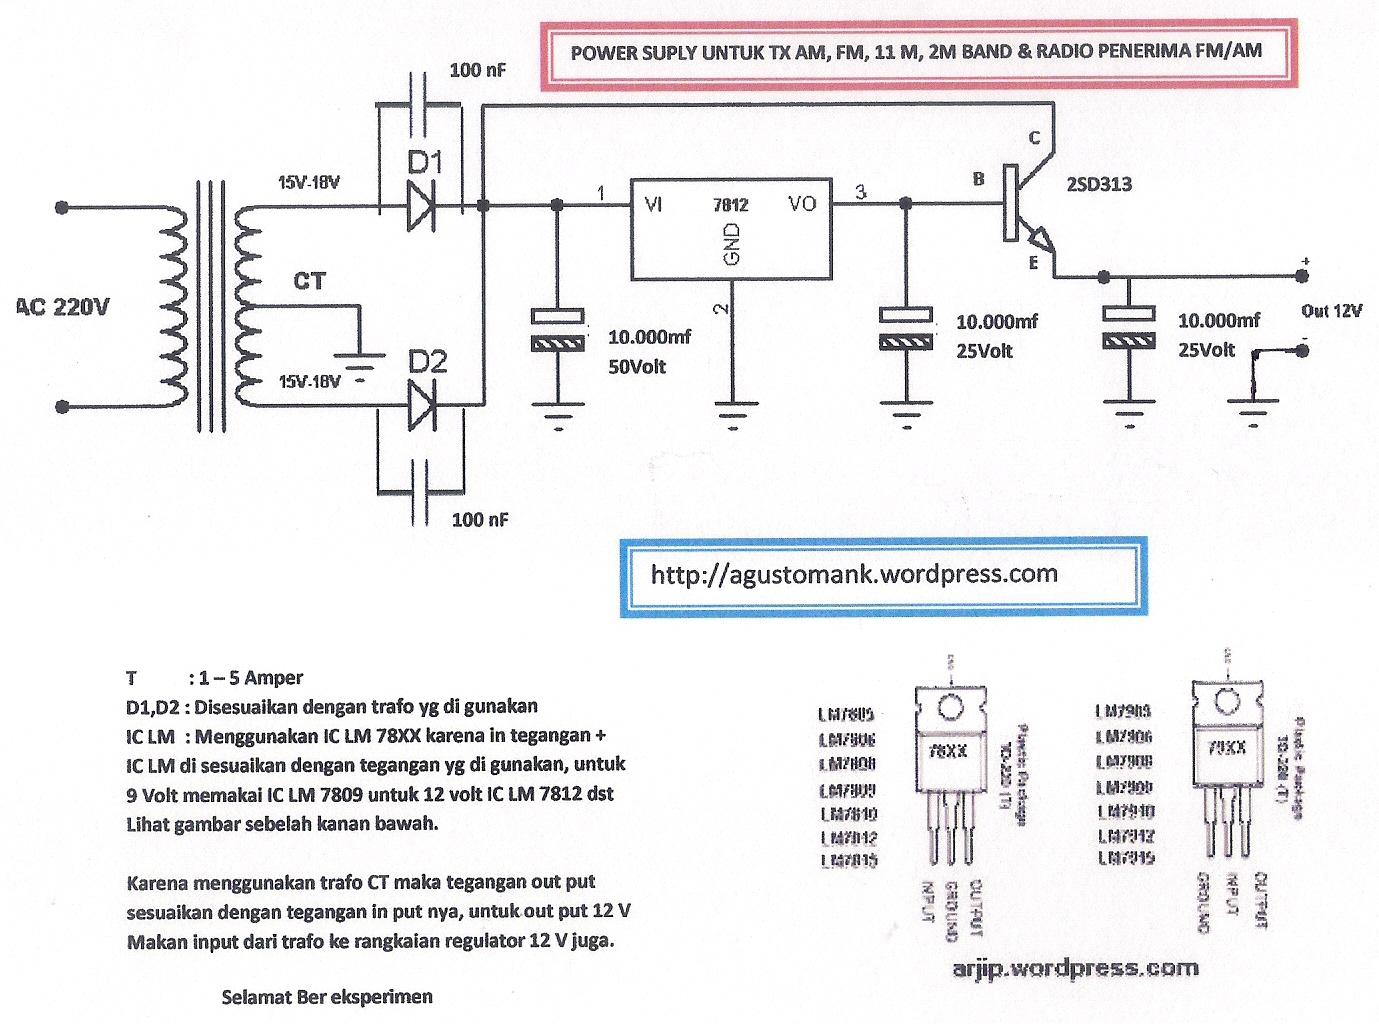 Kumpulan skema elektronika radio terlengkap elektronika kontrol power suply untuk pemancar am fm 11m 2m dan penerima fm dan am ccuart Choice Image